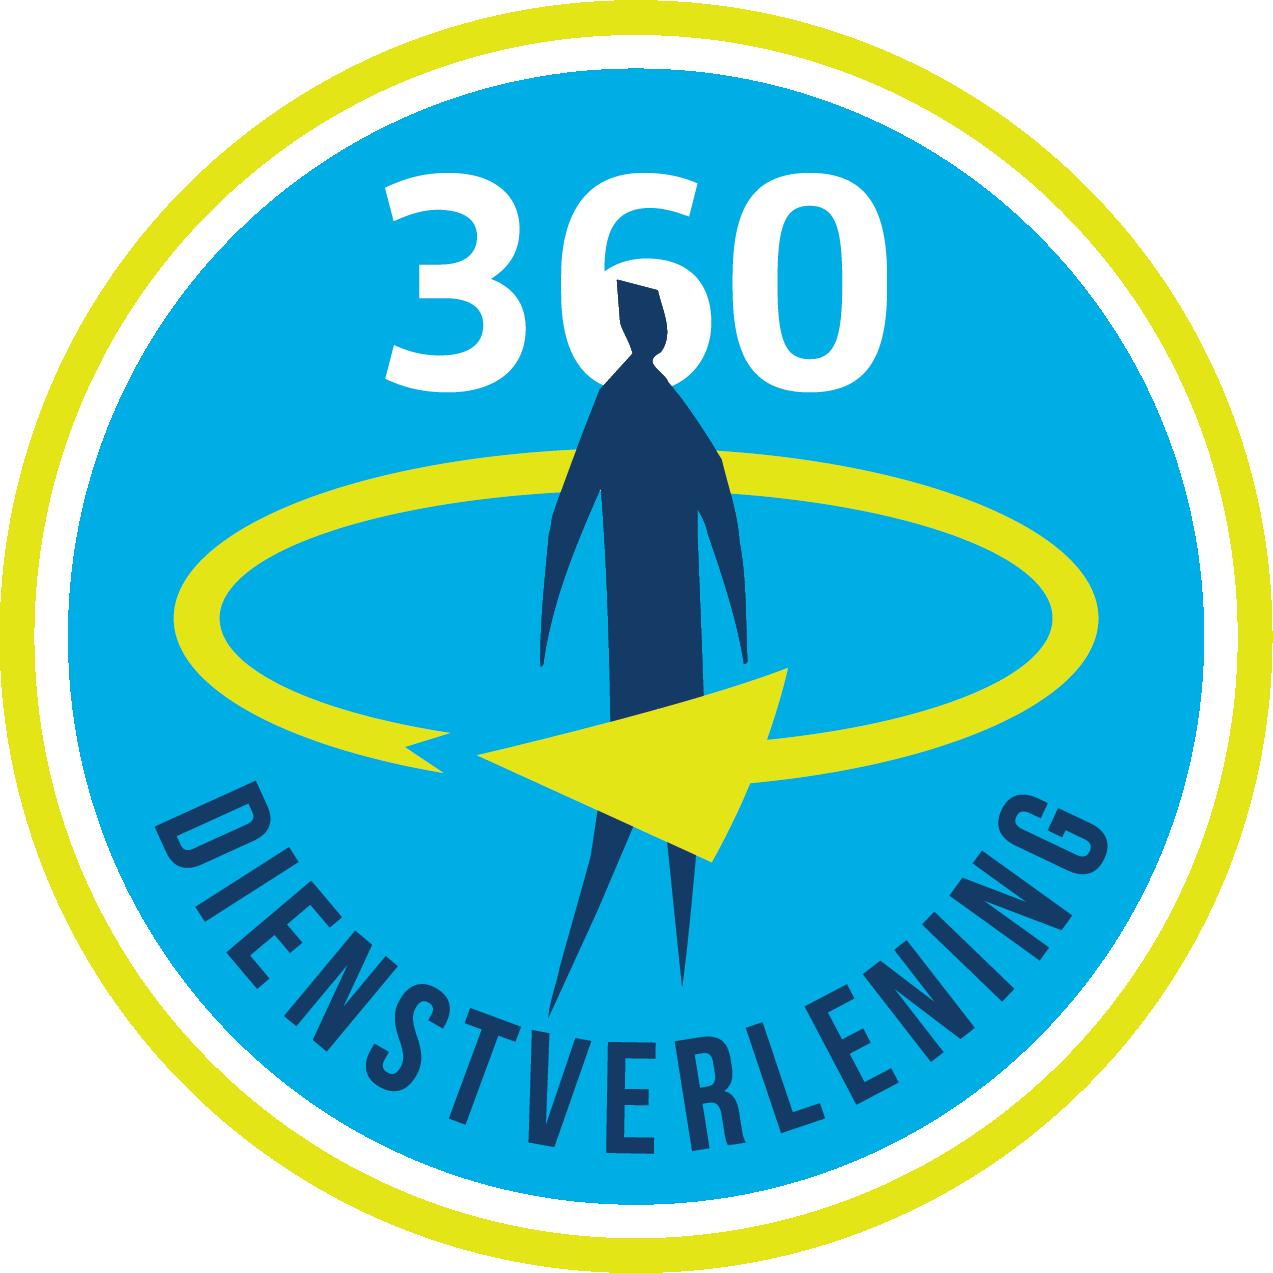 aclvb-universele_diensten-logo-cmyk_ok-2_1.png